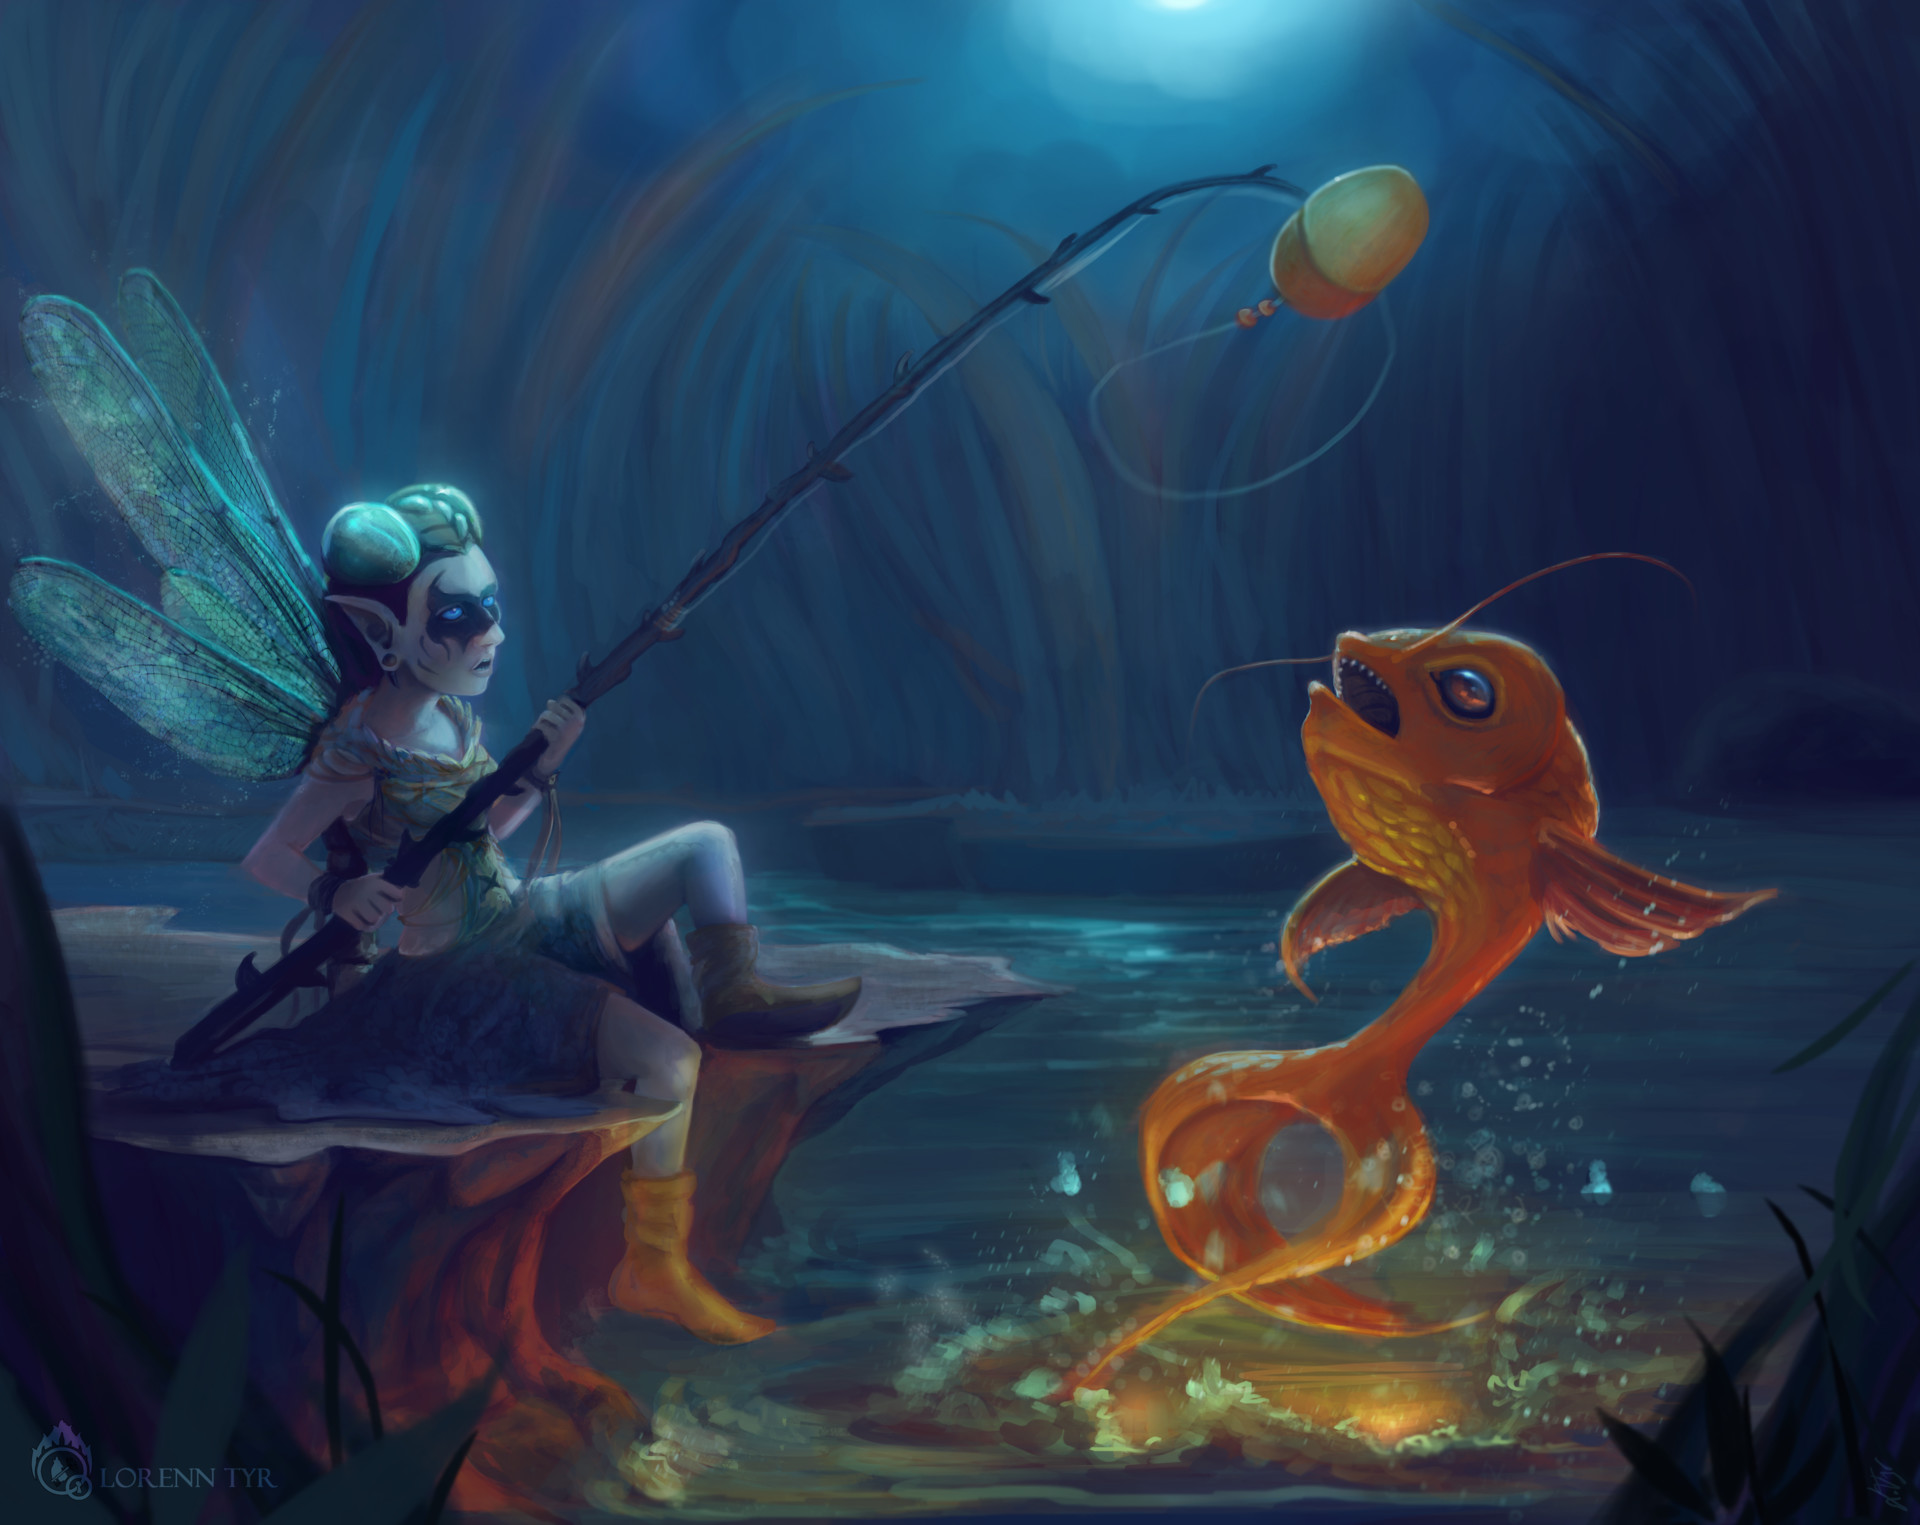 Lorenn tyr hada pescando normal